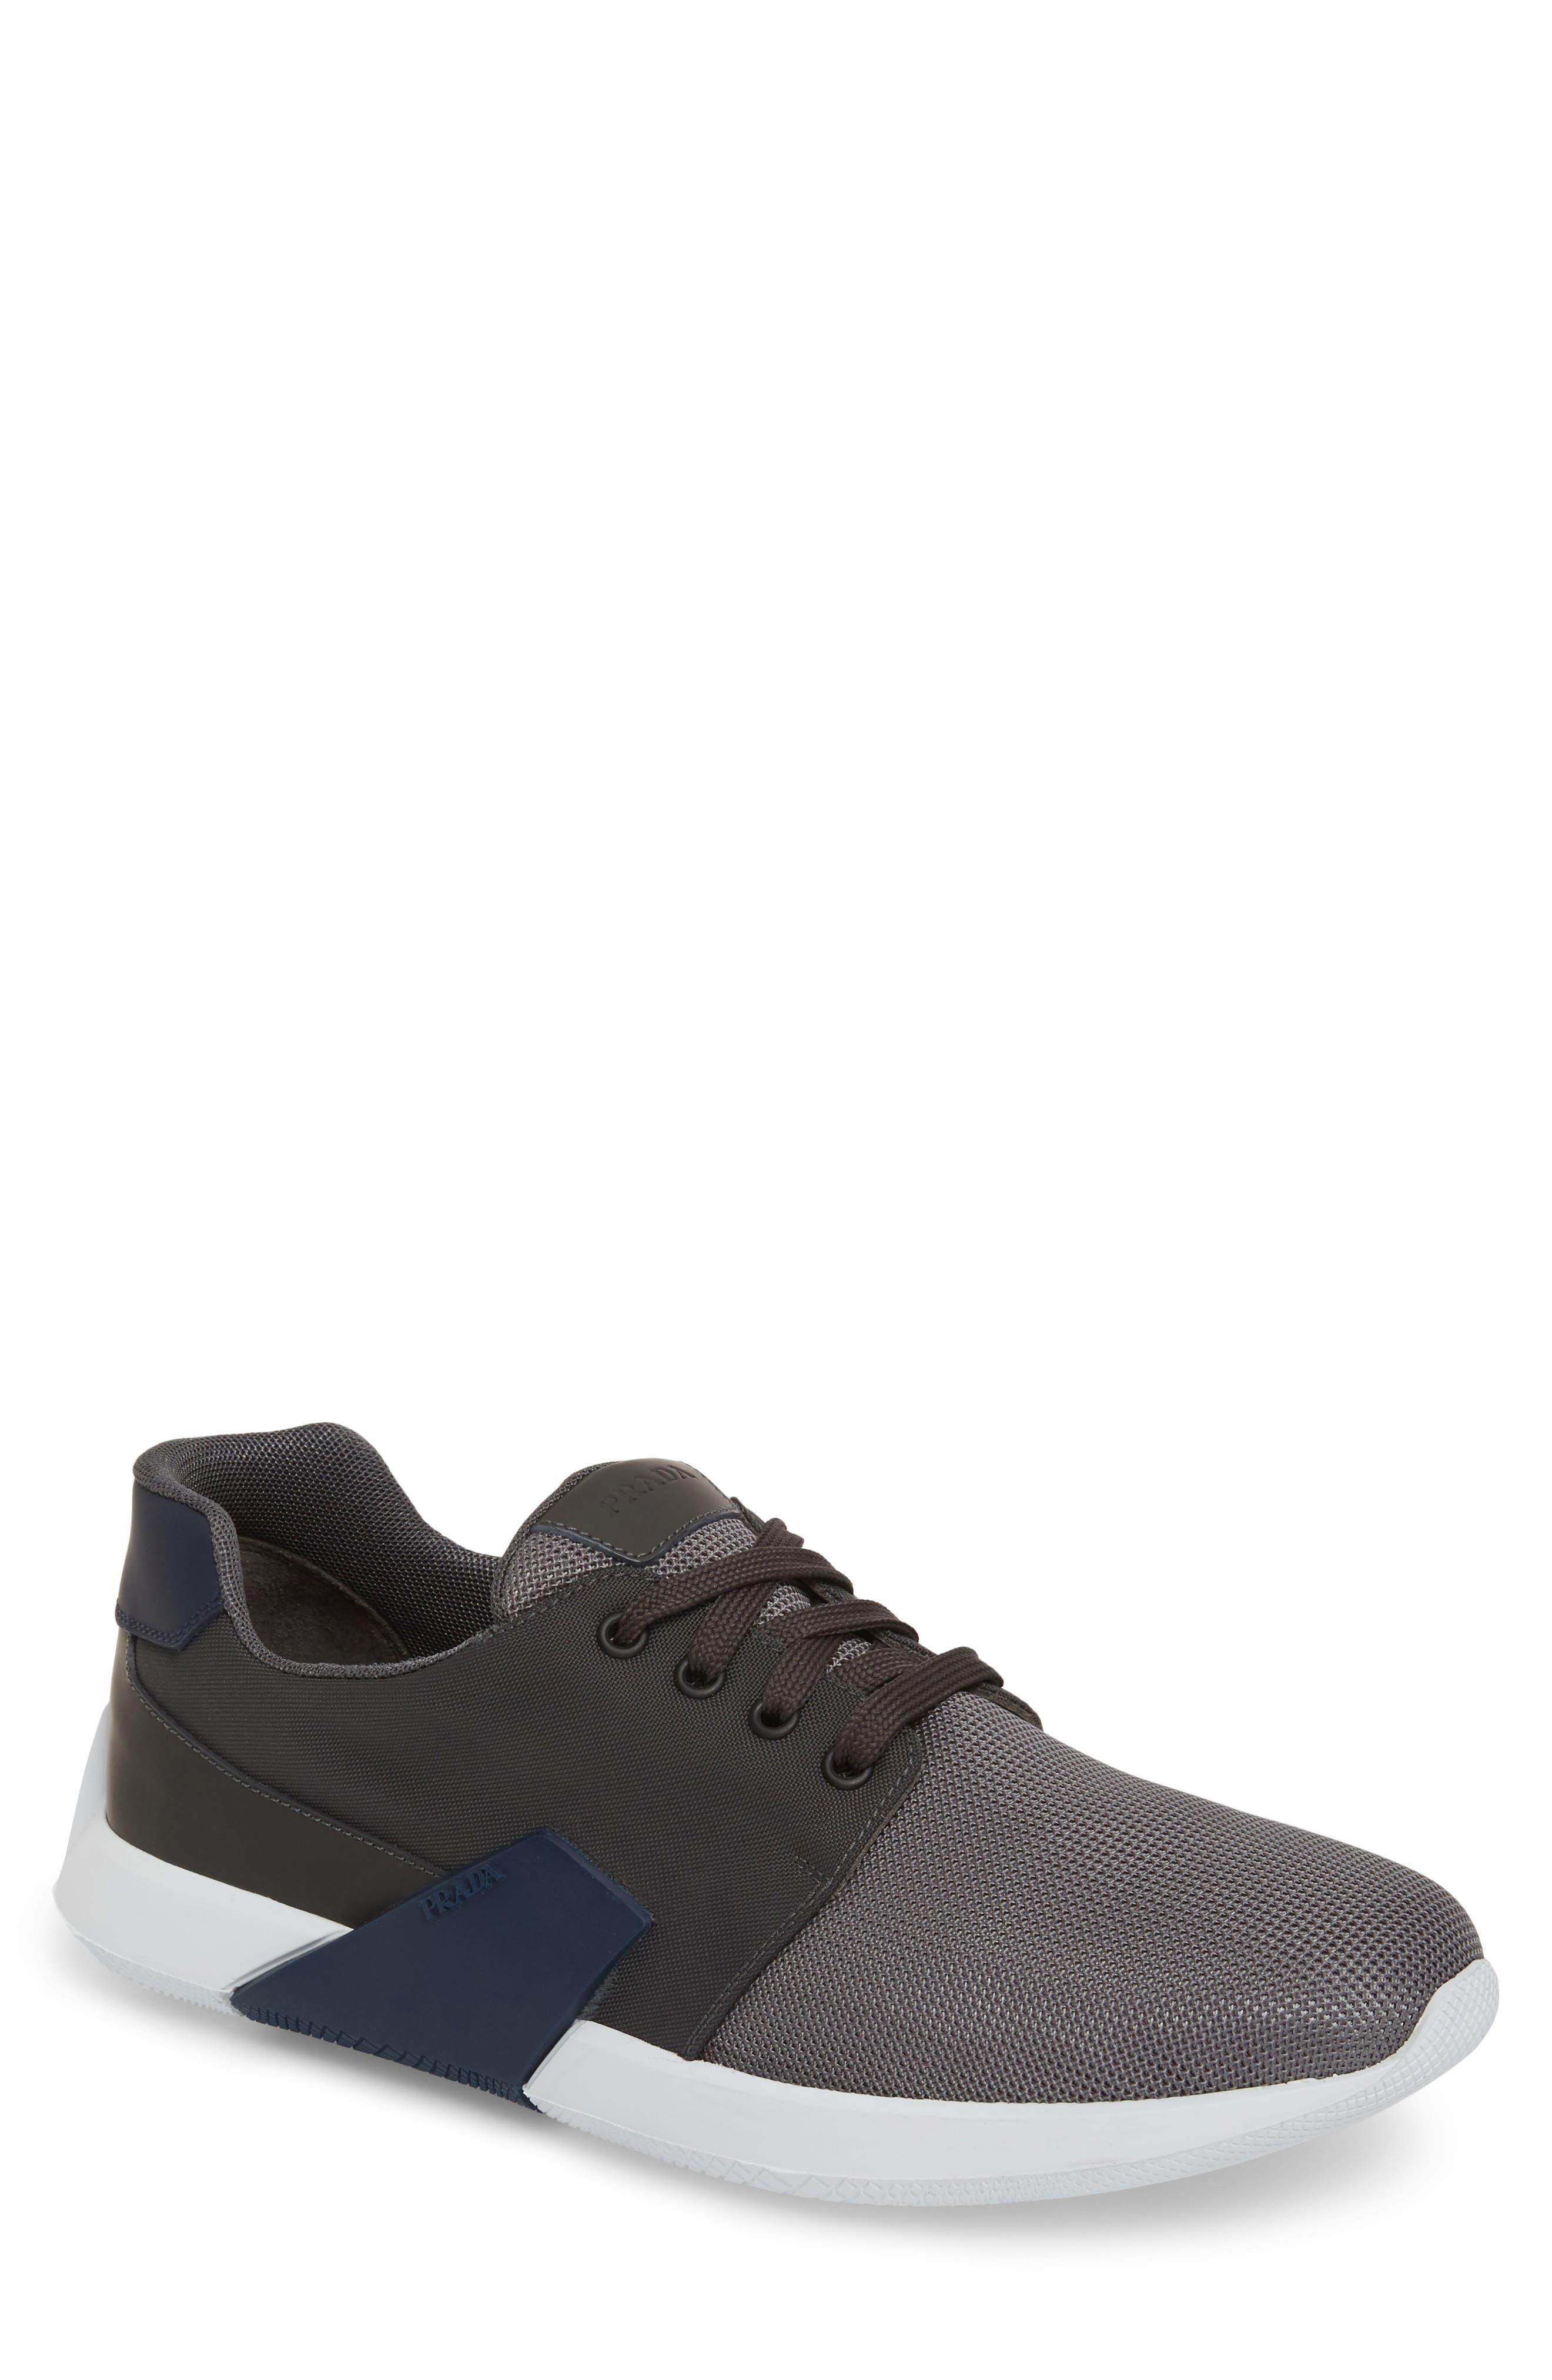 Prada Linea Rossa Sneaker (Men)